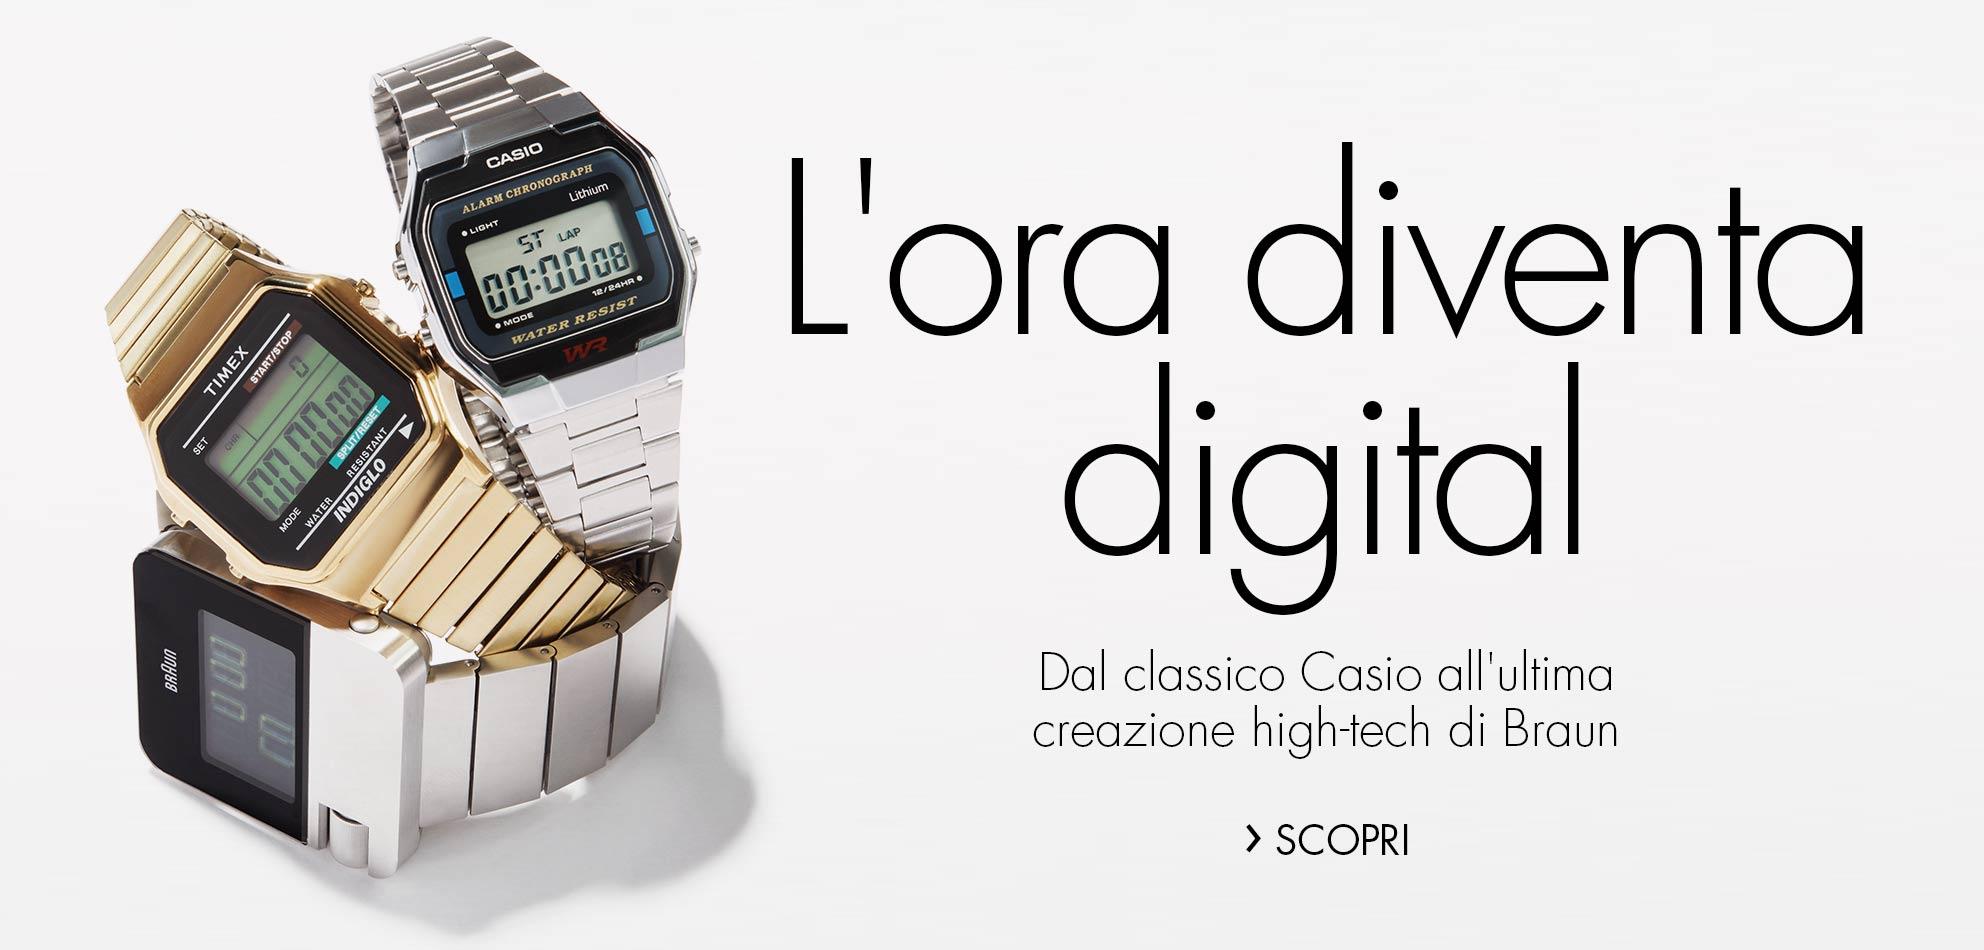 L'ora diventa digital